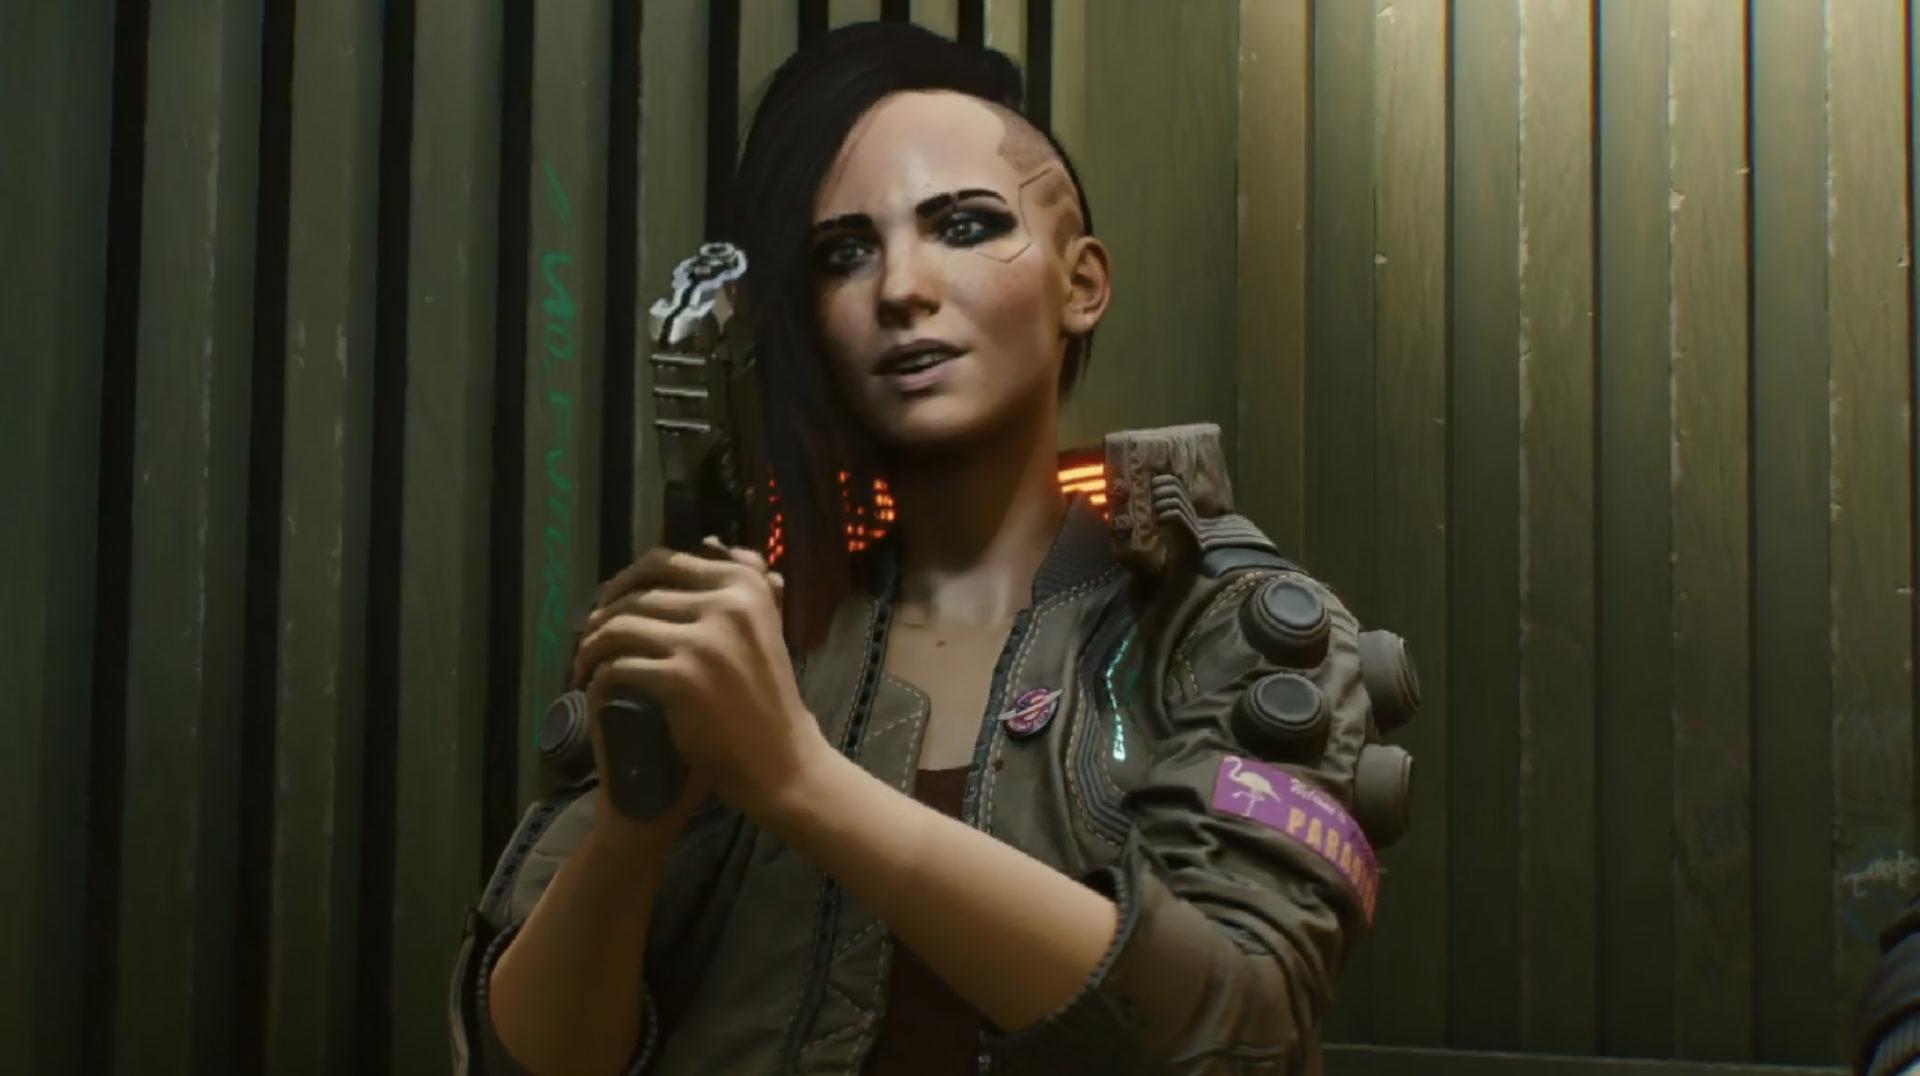 Screenshot of Cyberpunk 2077 protagonist V.